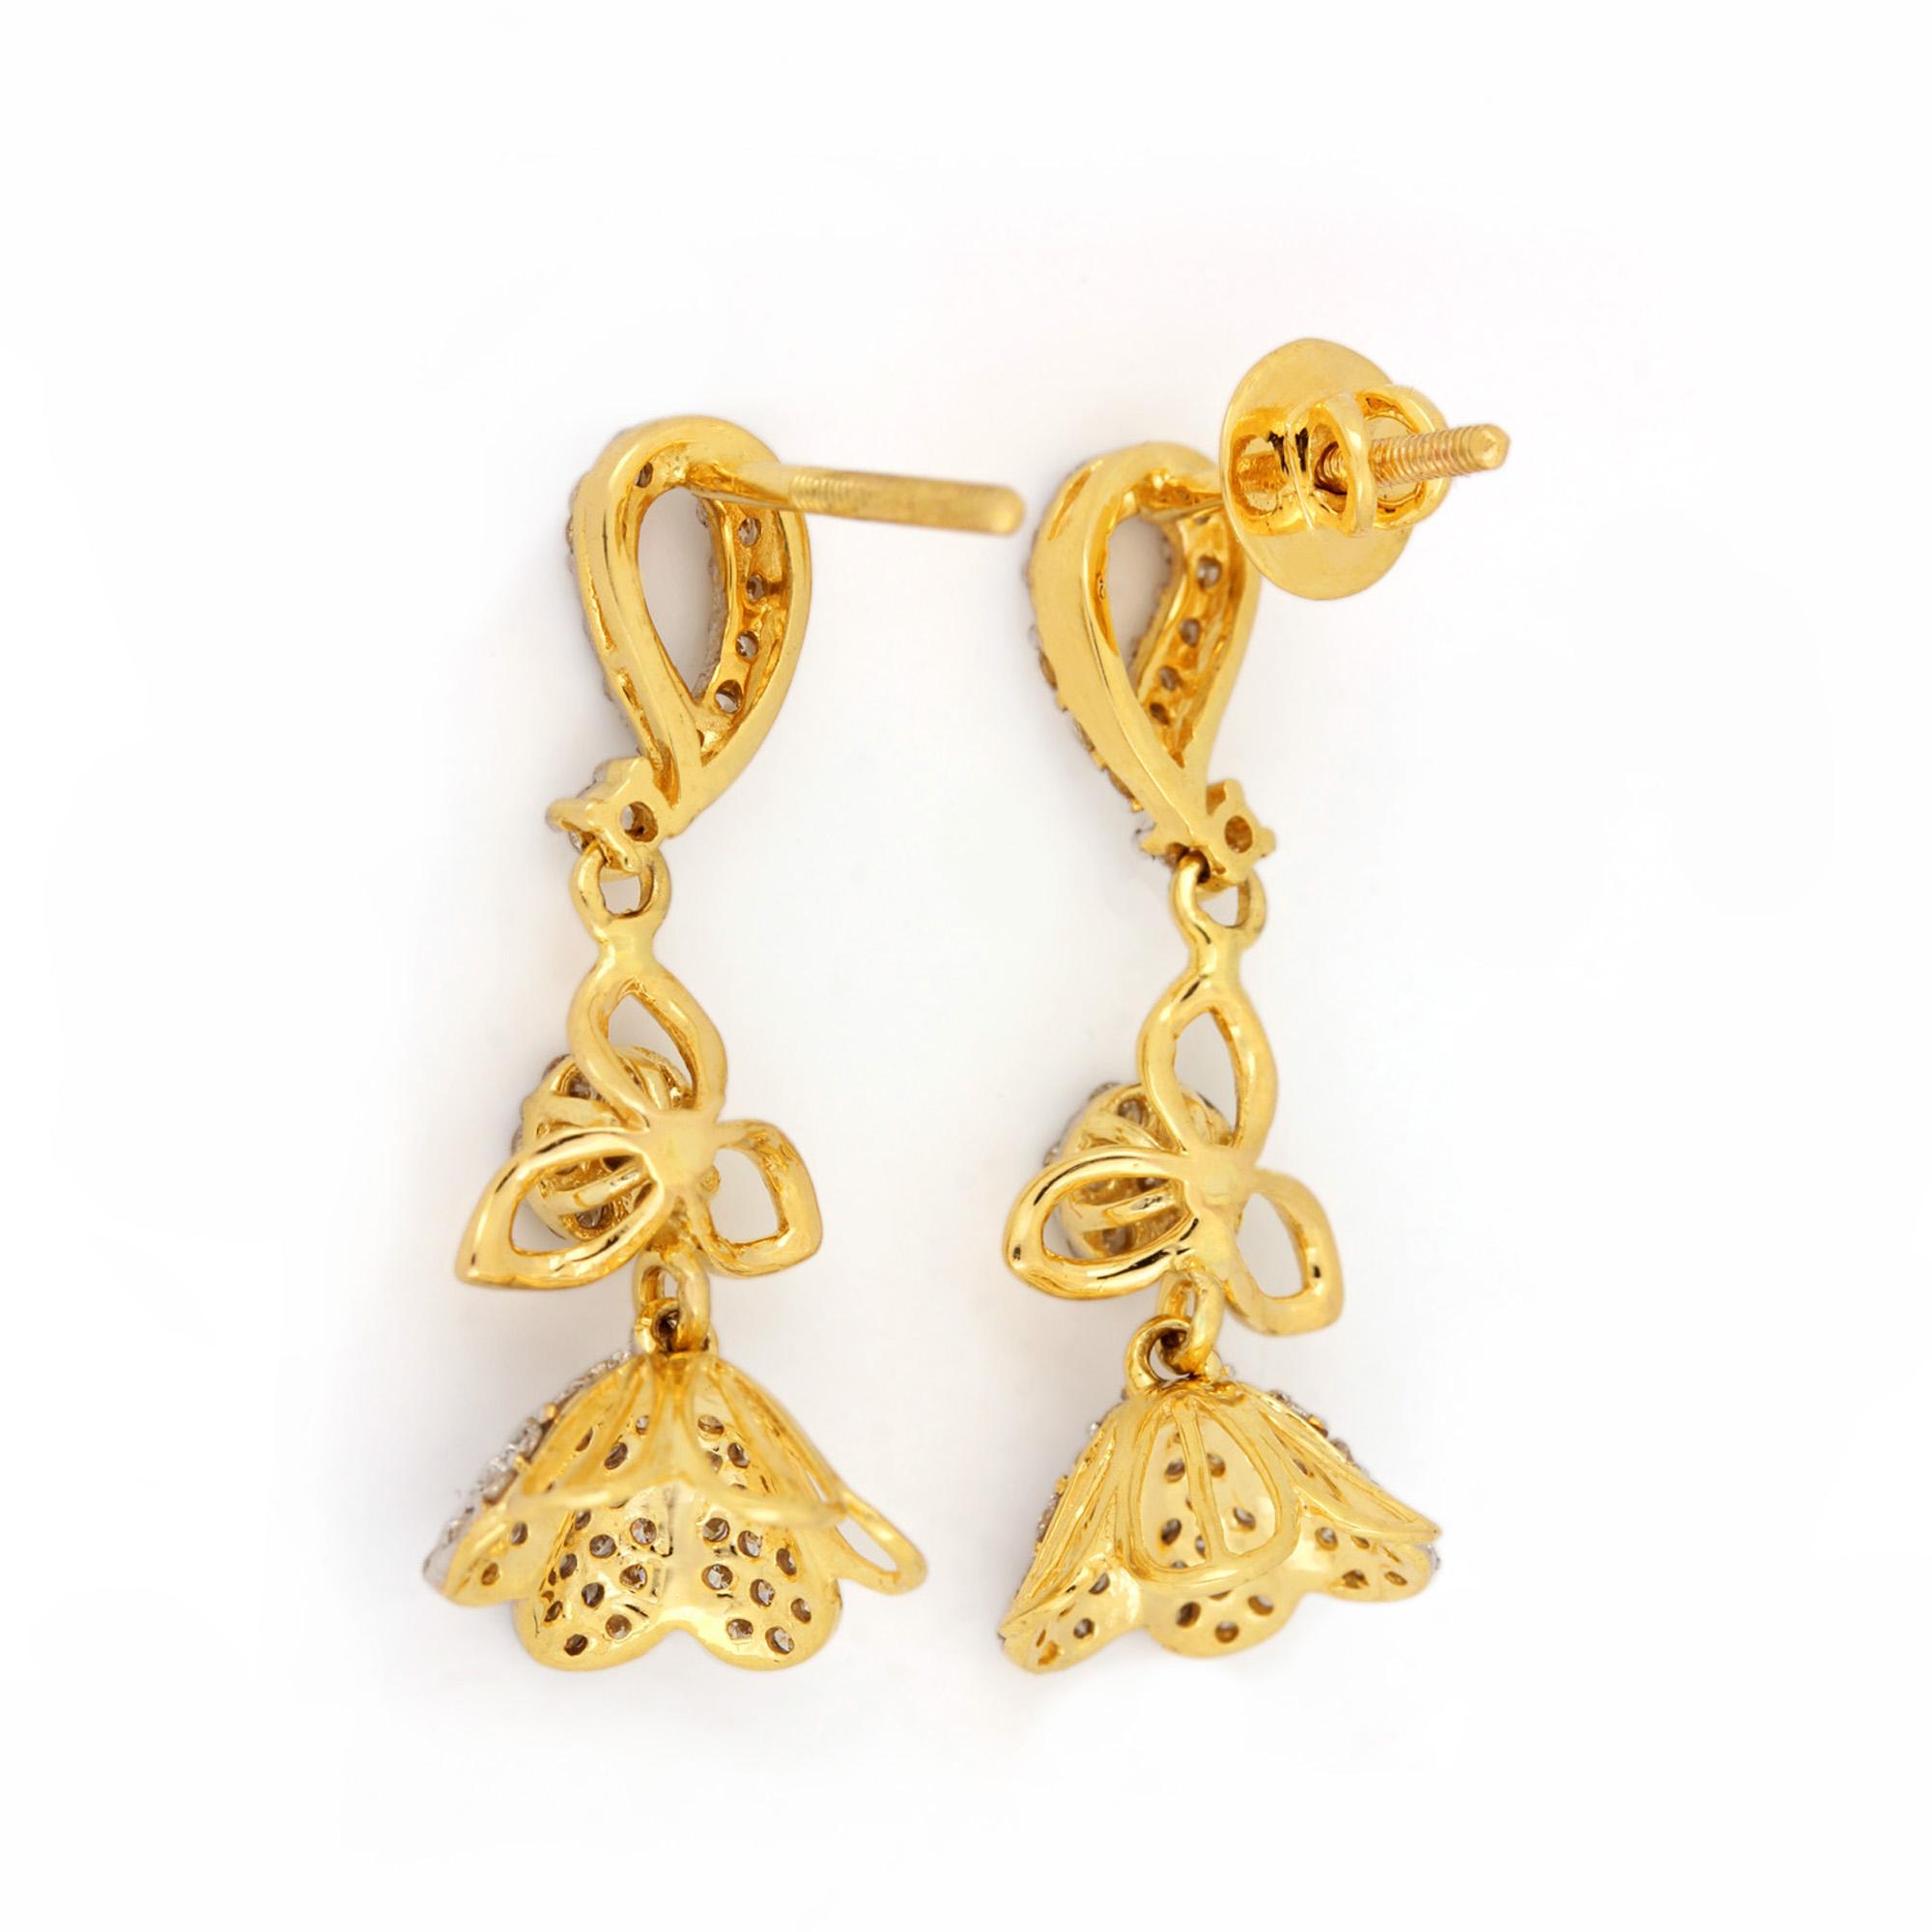 Diamond Attractive Earrings In Gold